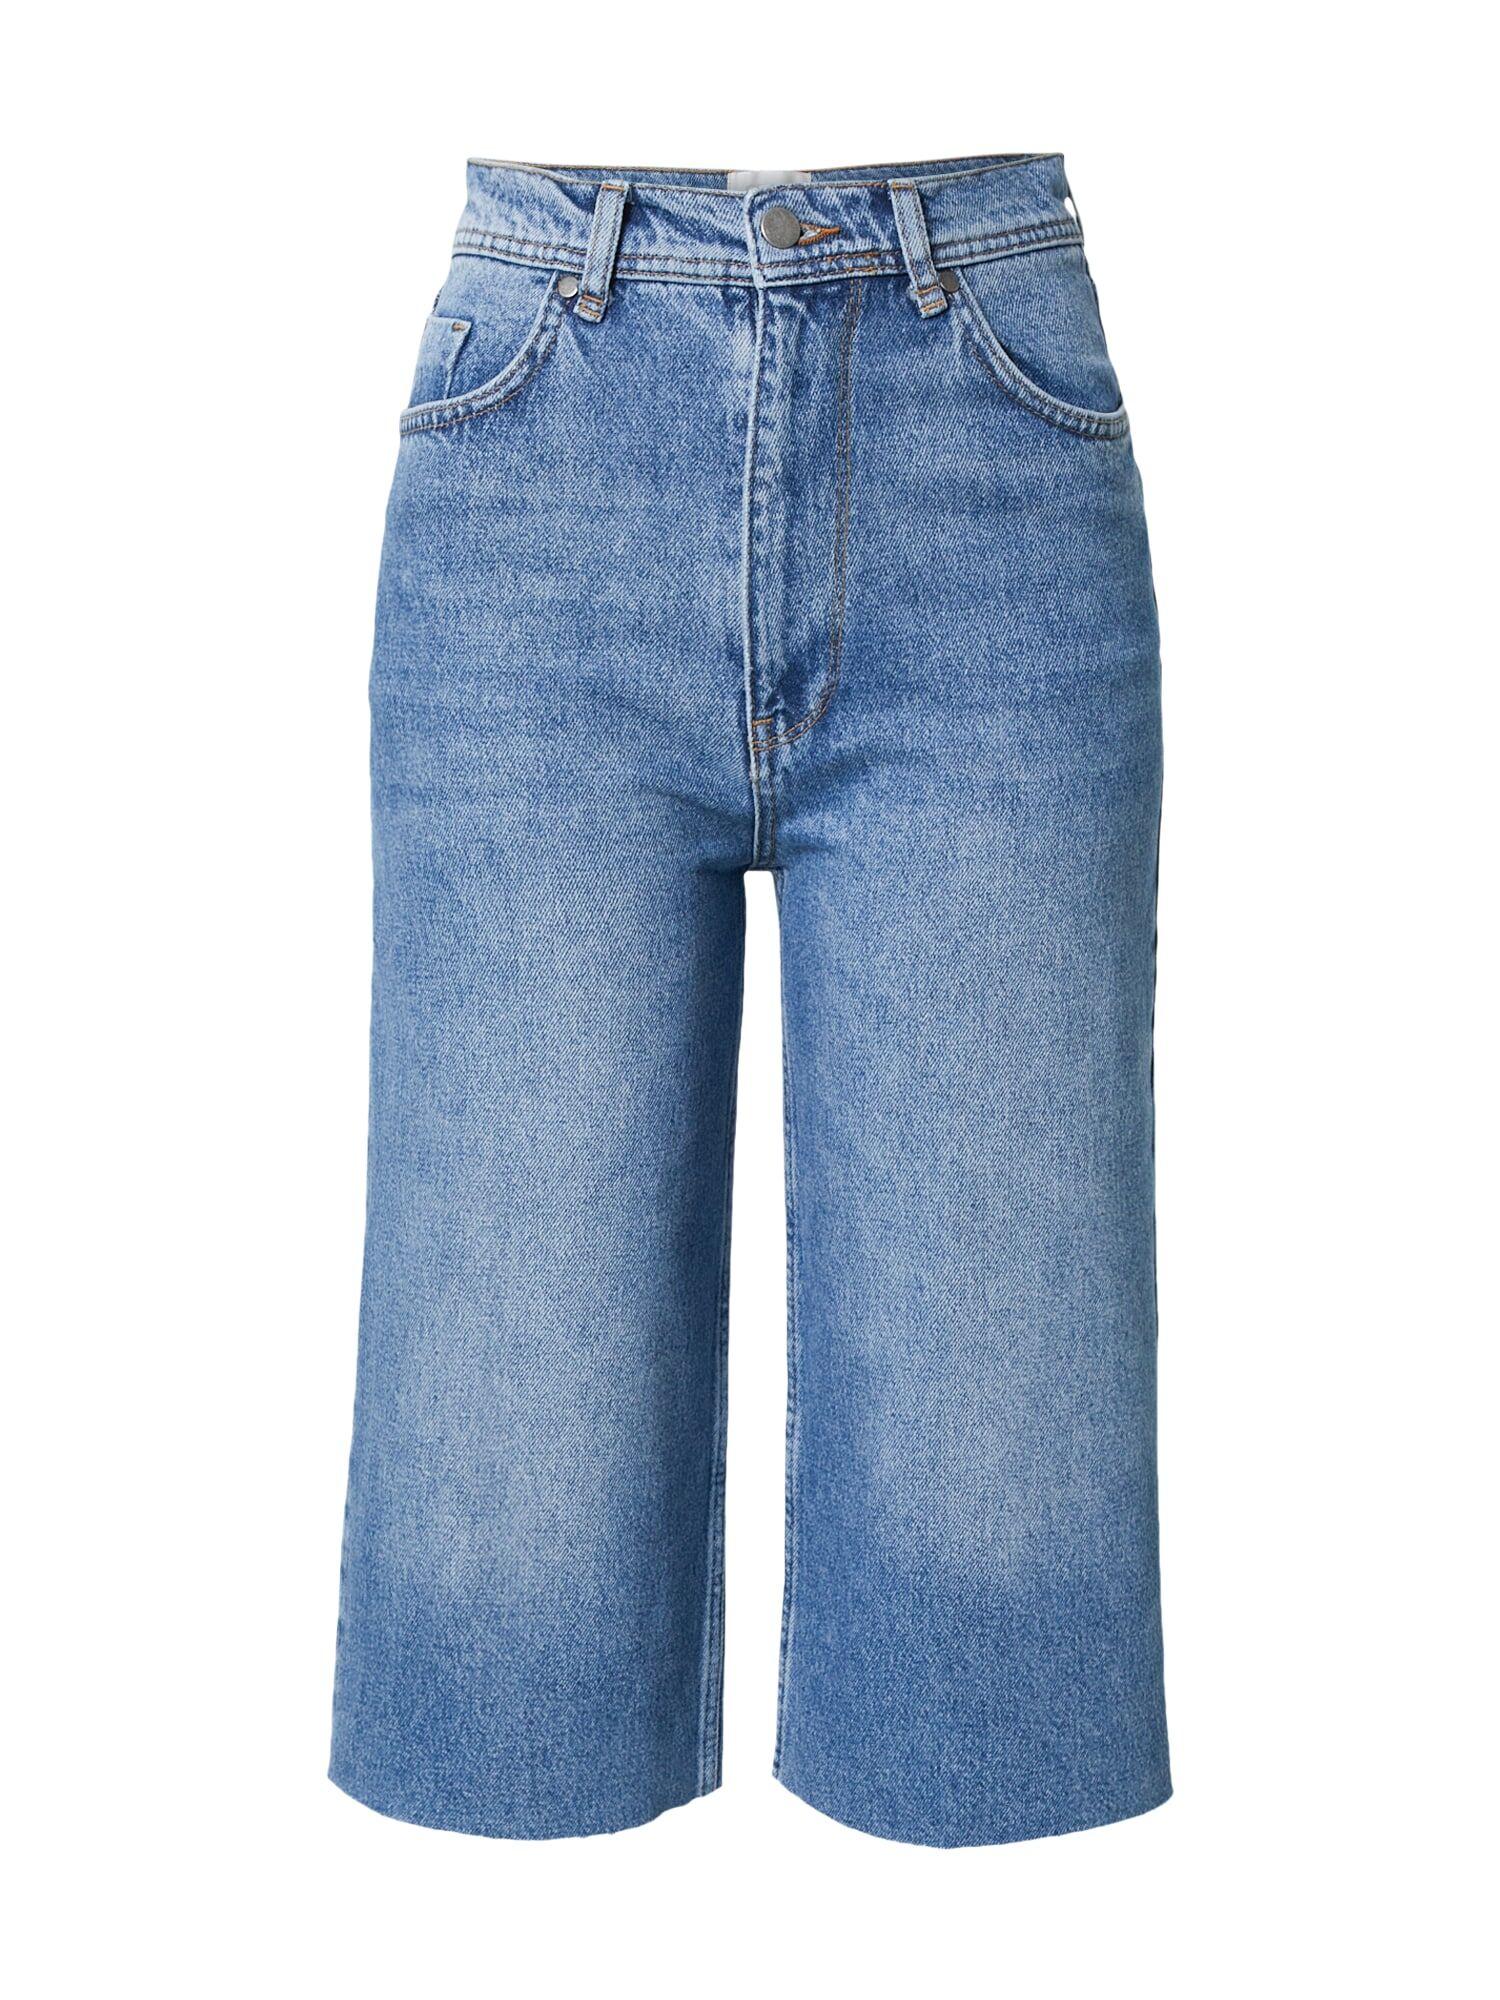 minus jeans 'joy' blu